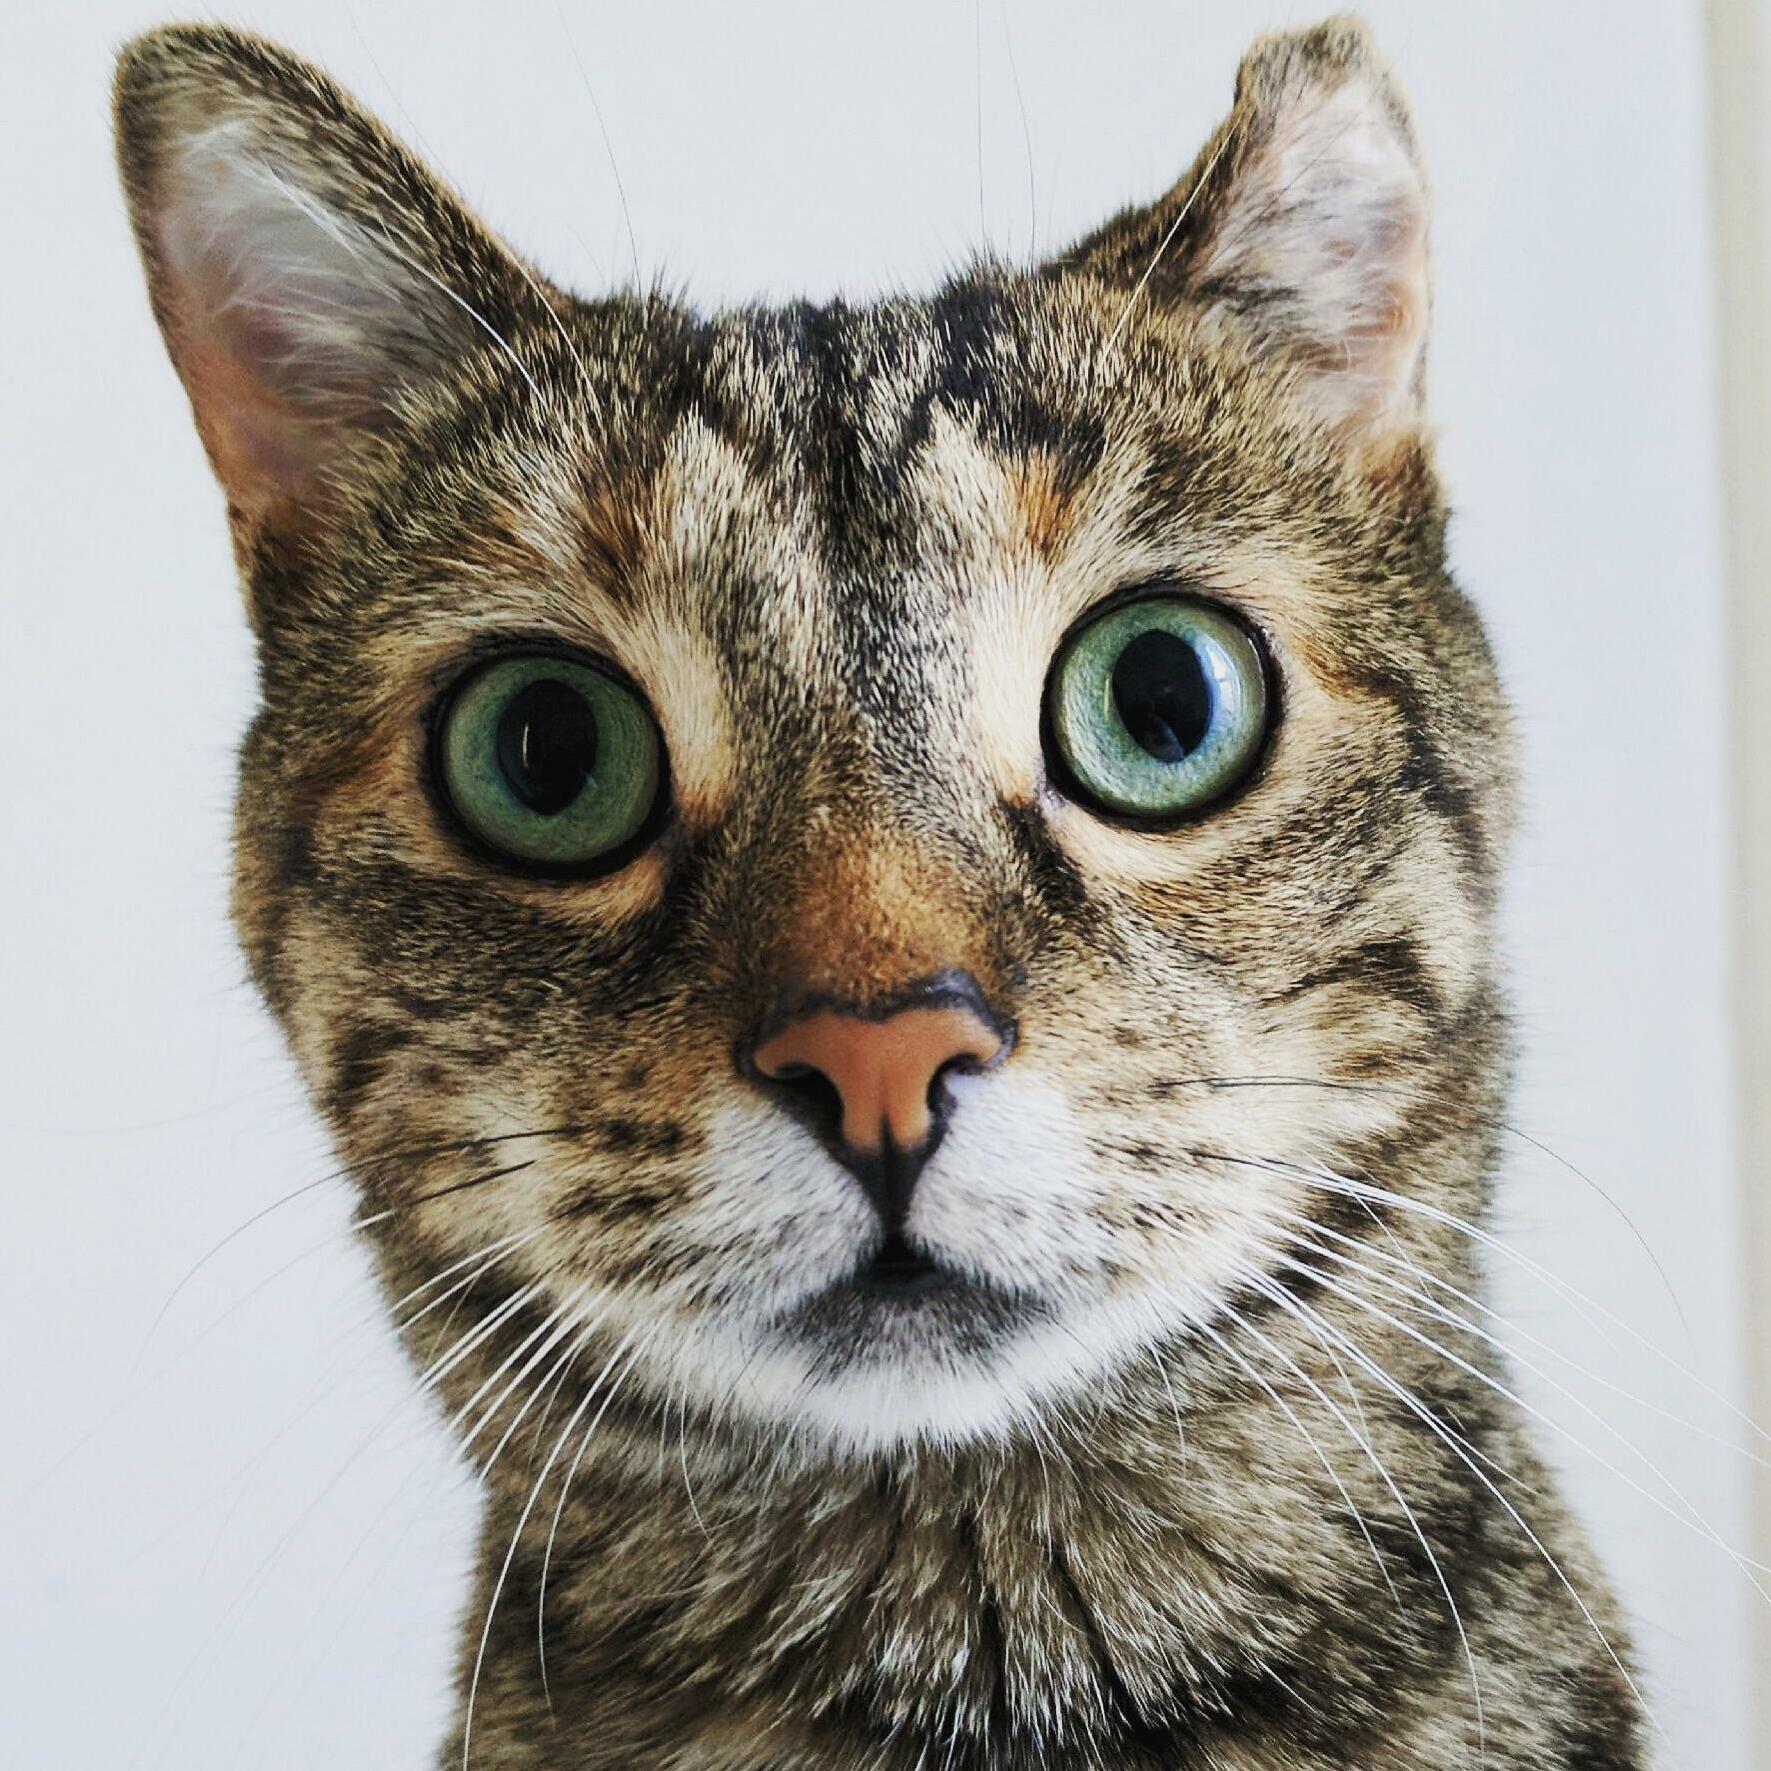 Twiggy t adventurecat and her wonky ear.